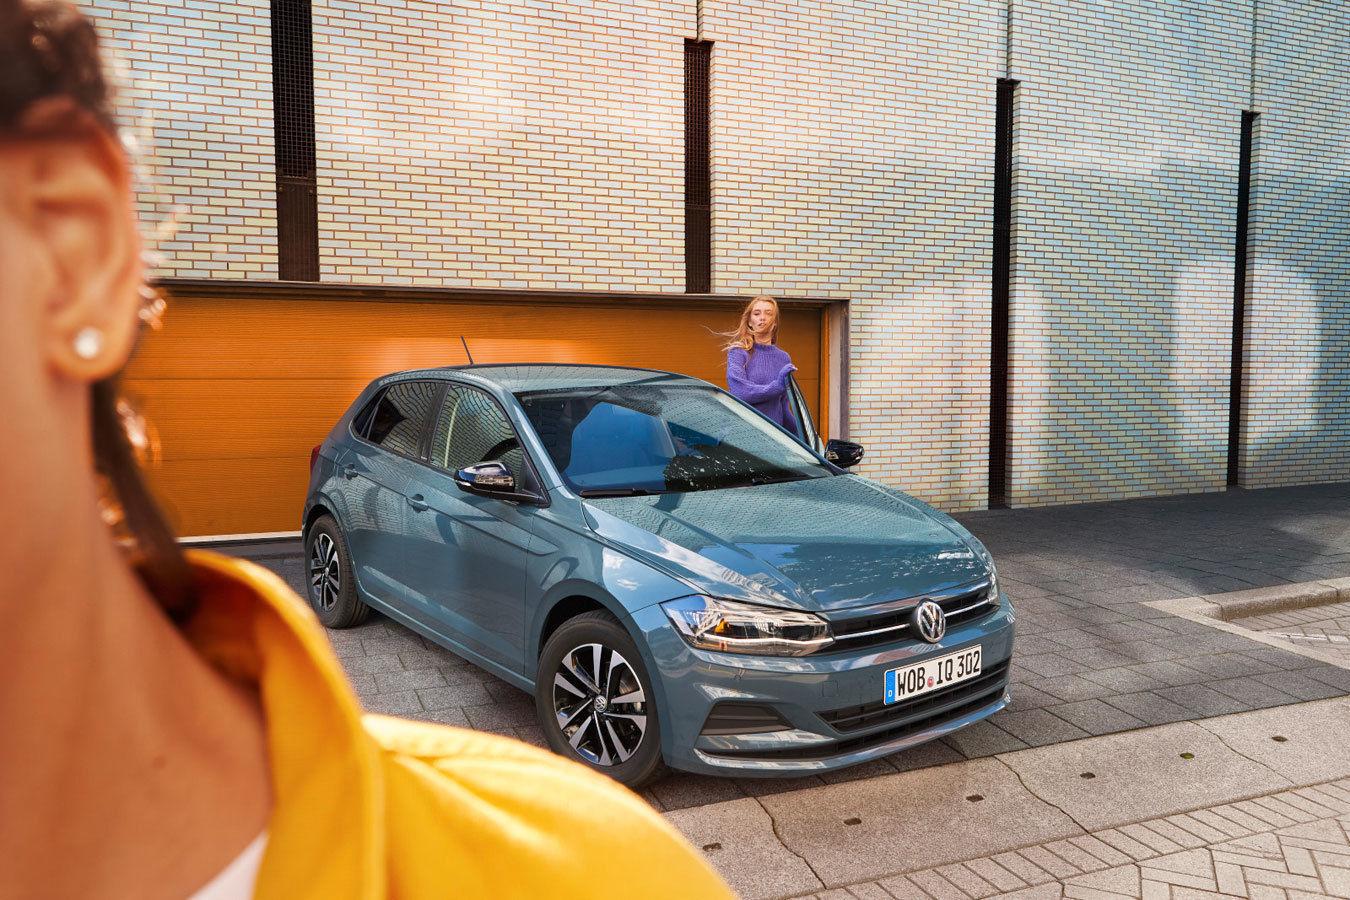 KLEIN PHOTOGRAPHEN : Emir Haveric for VW IQ Drive